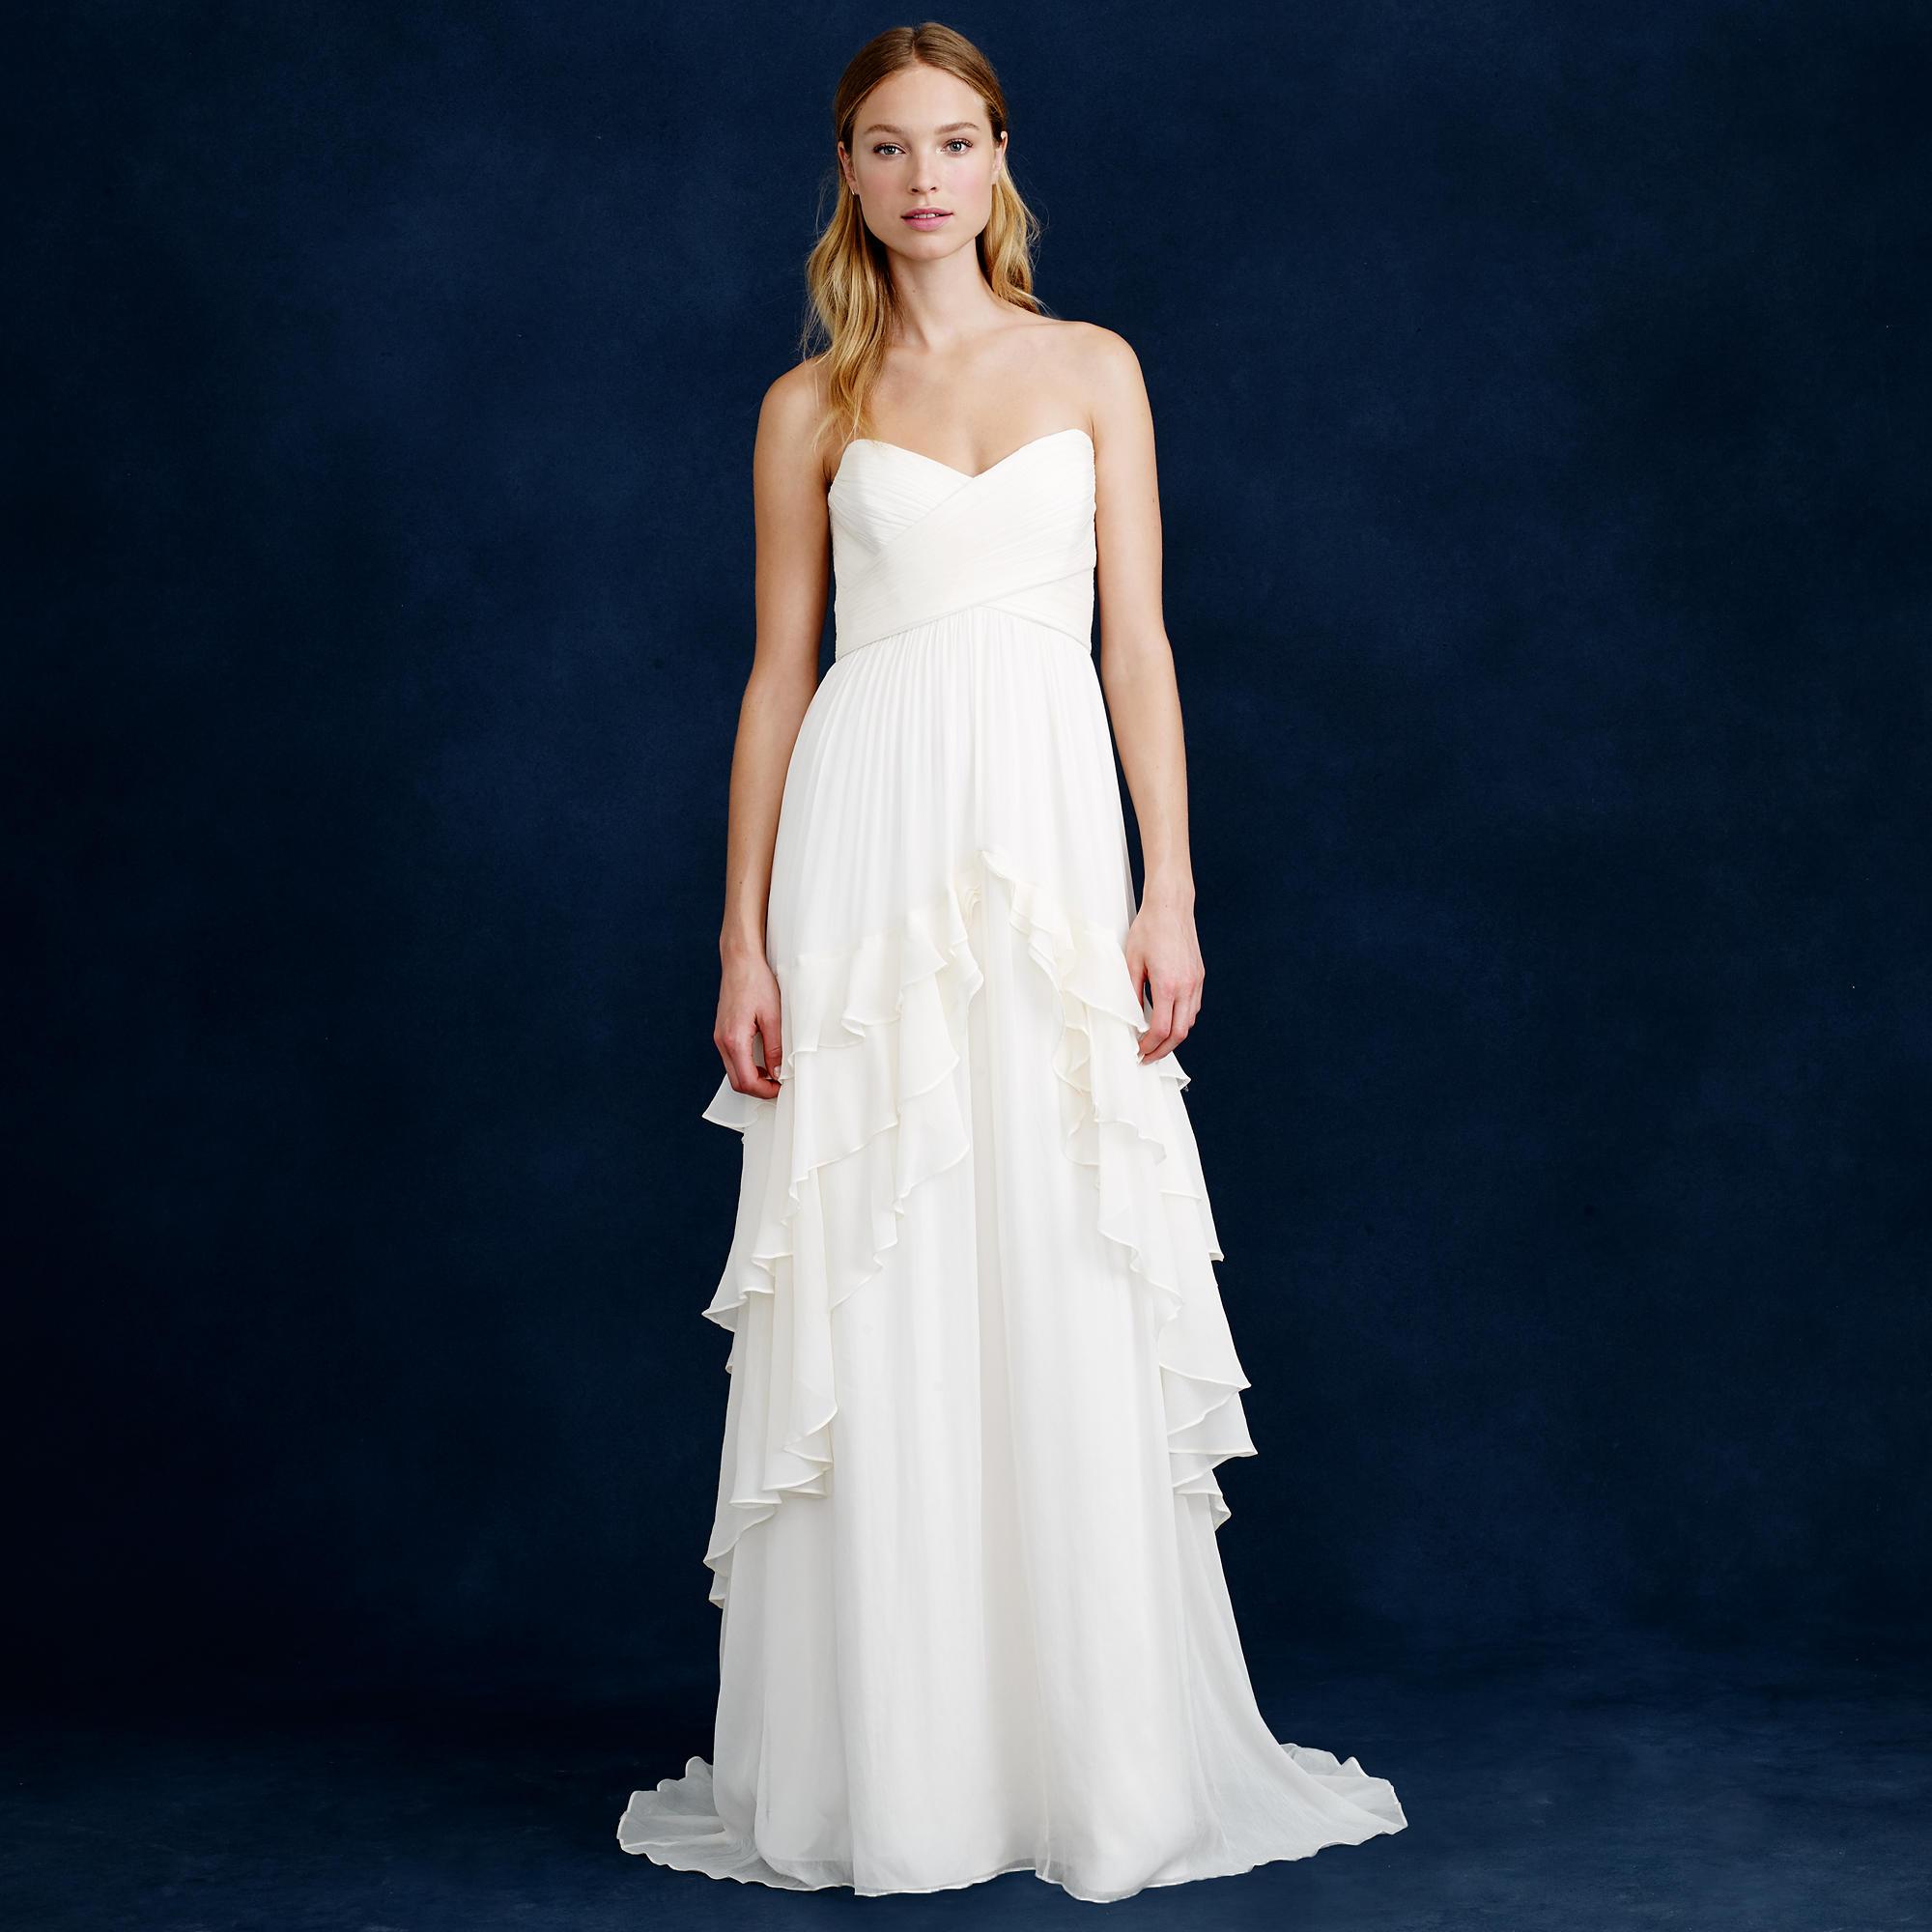 Ruffled Wedding Dress Under $1000